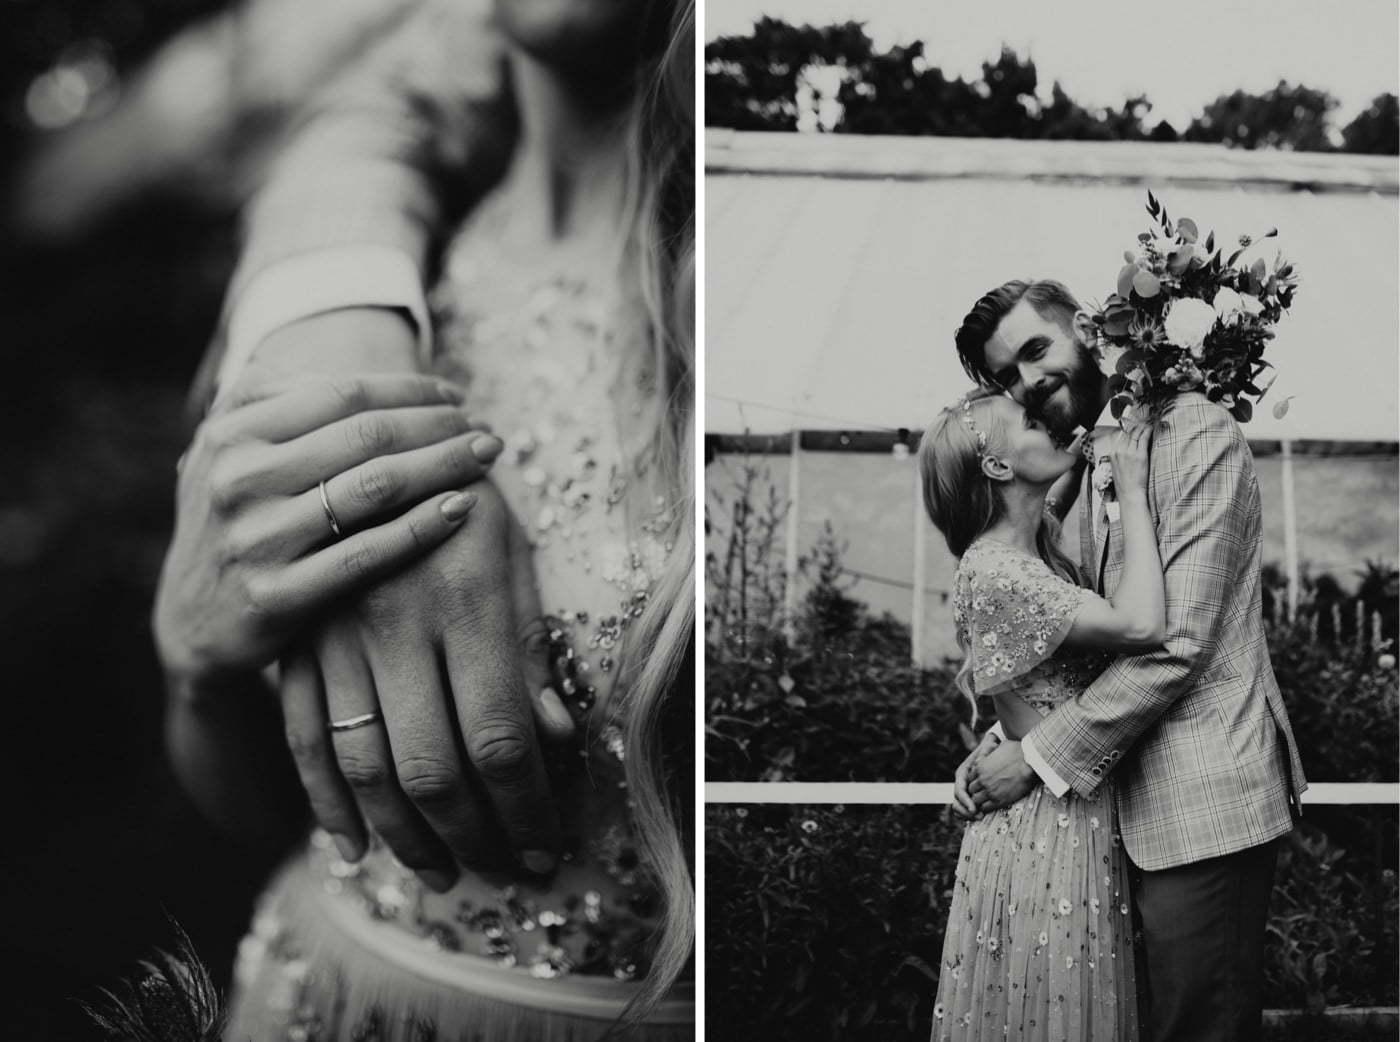 ewelina zieba rustykalne wesele stara oranzeria warszawa 031